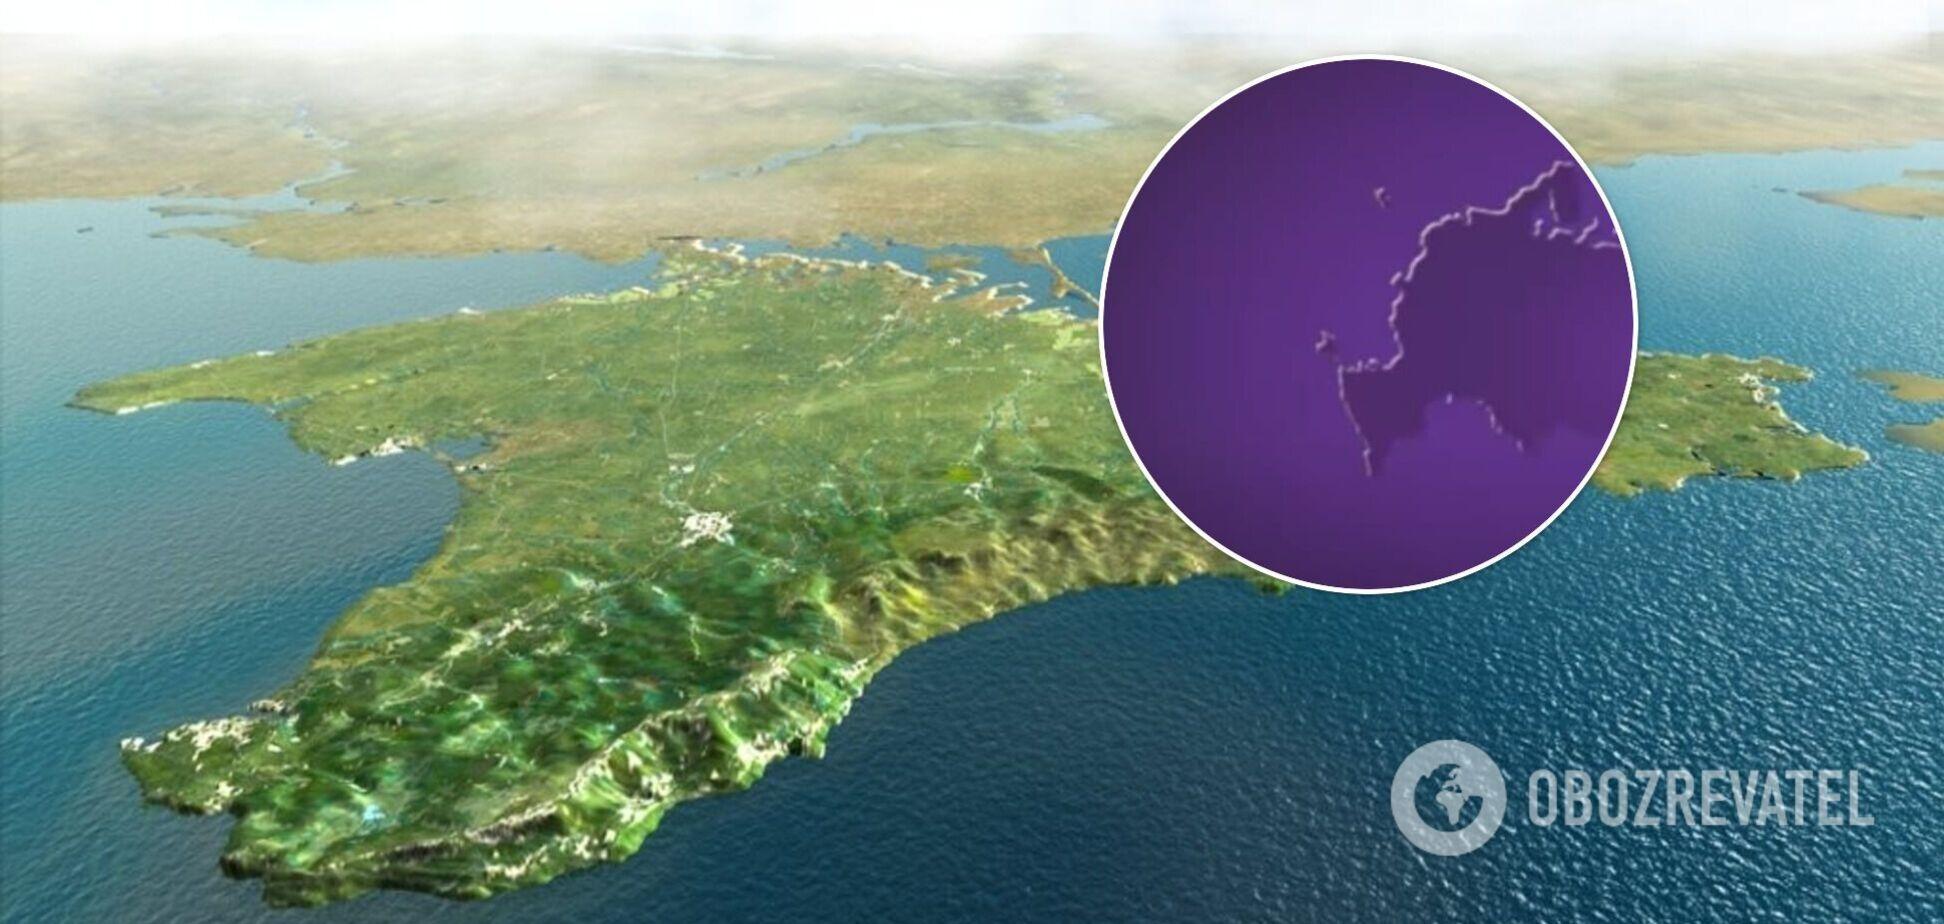 Український телеканал показав карту РФ з окупованим Кримом. Фото